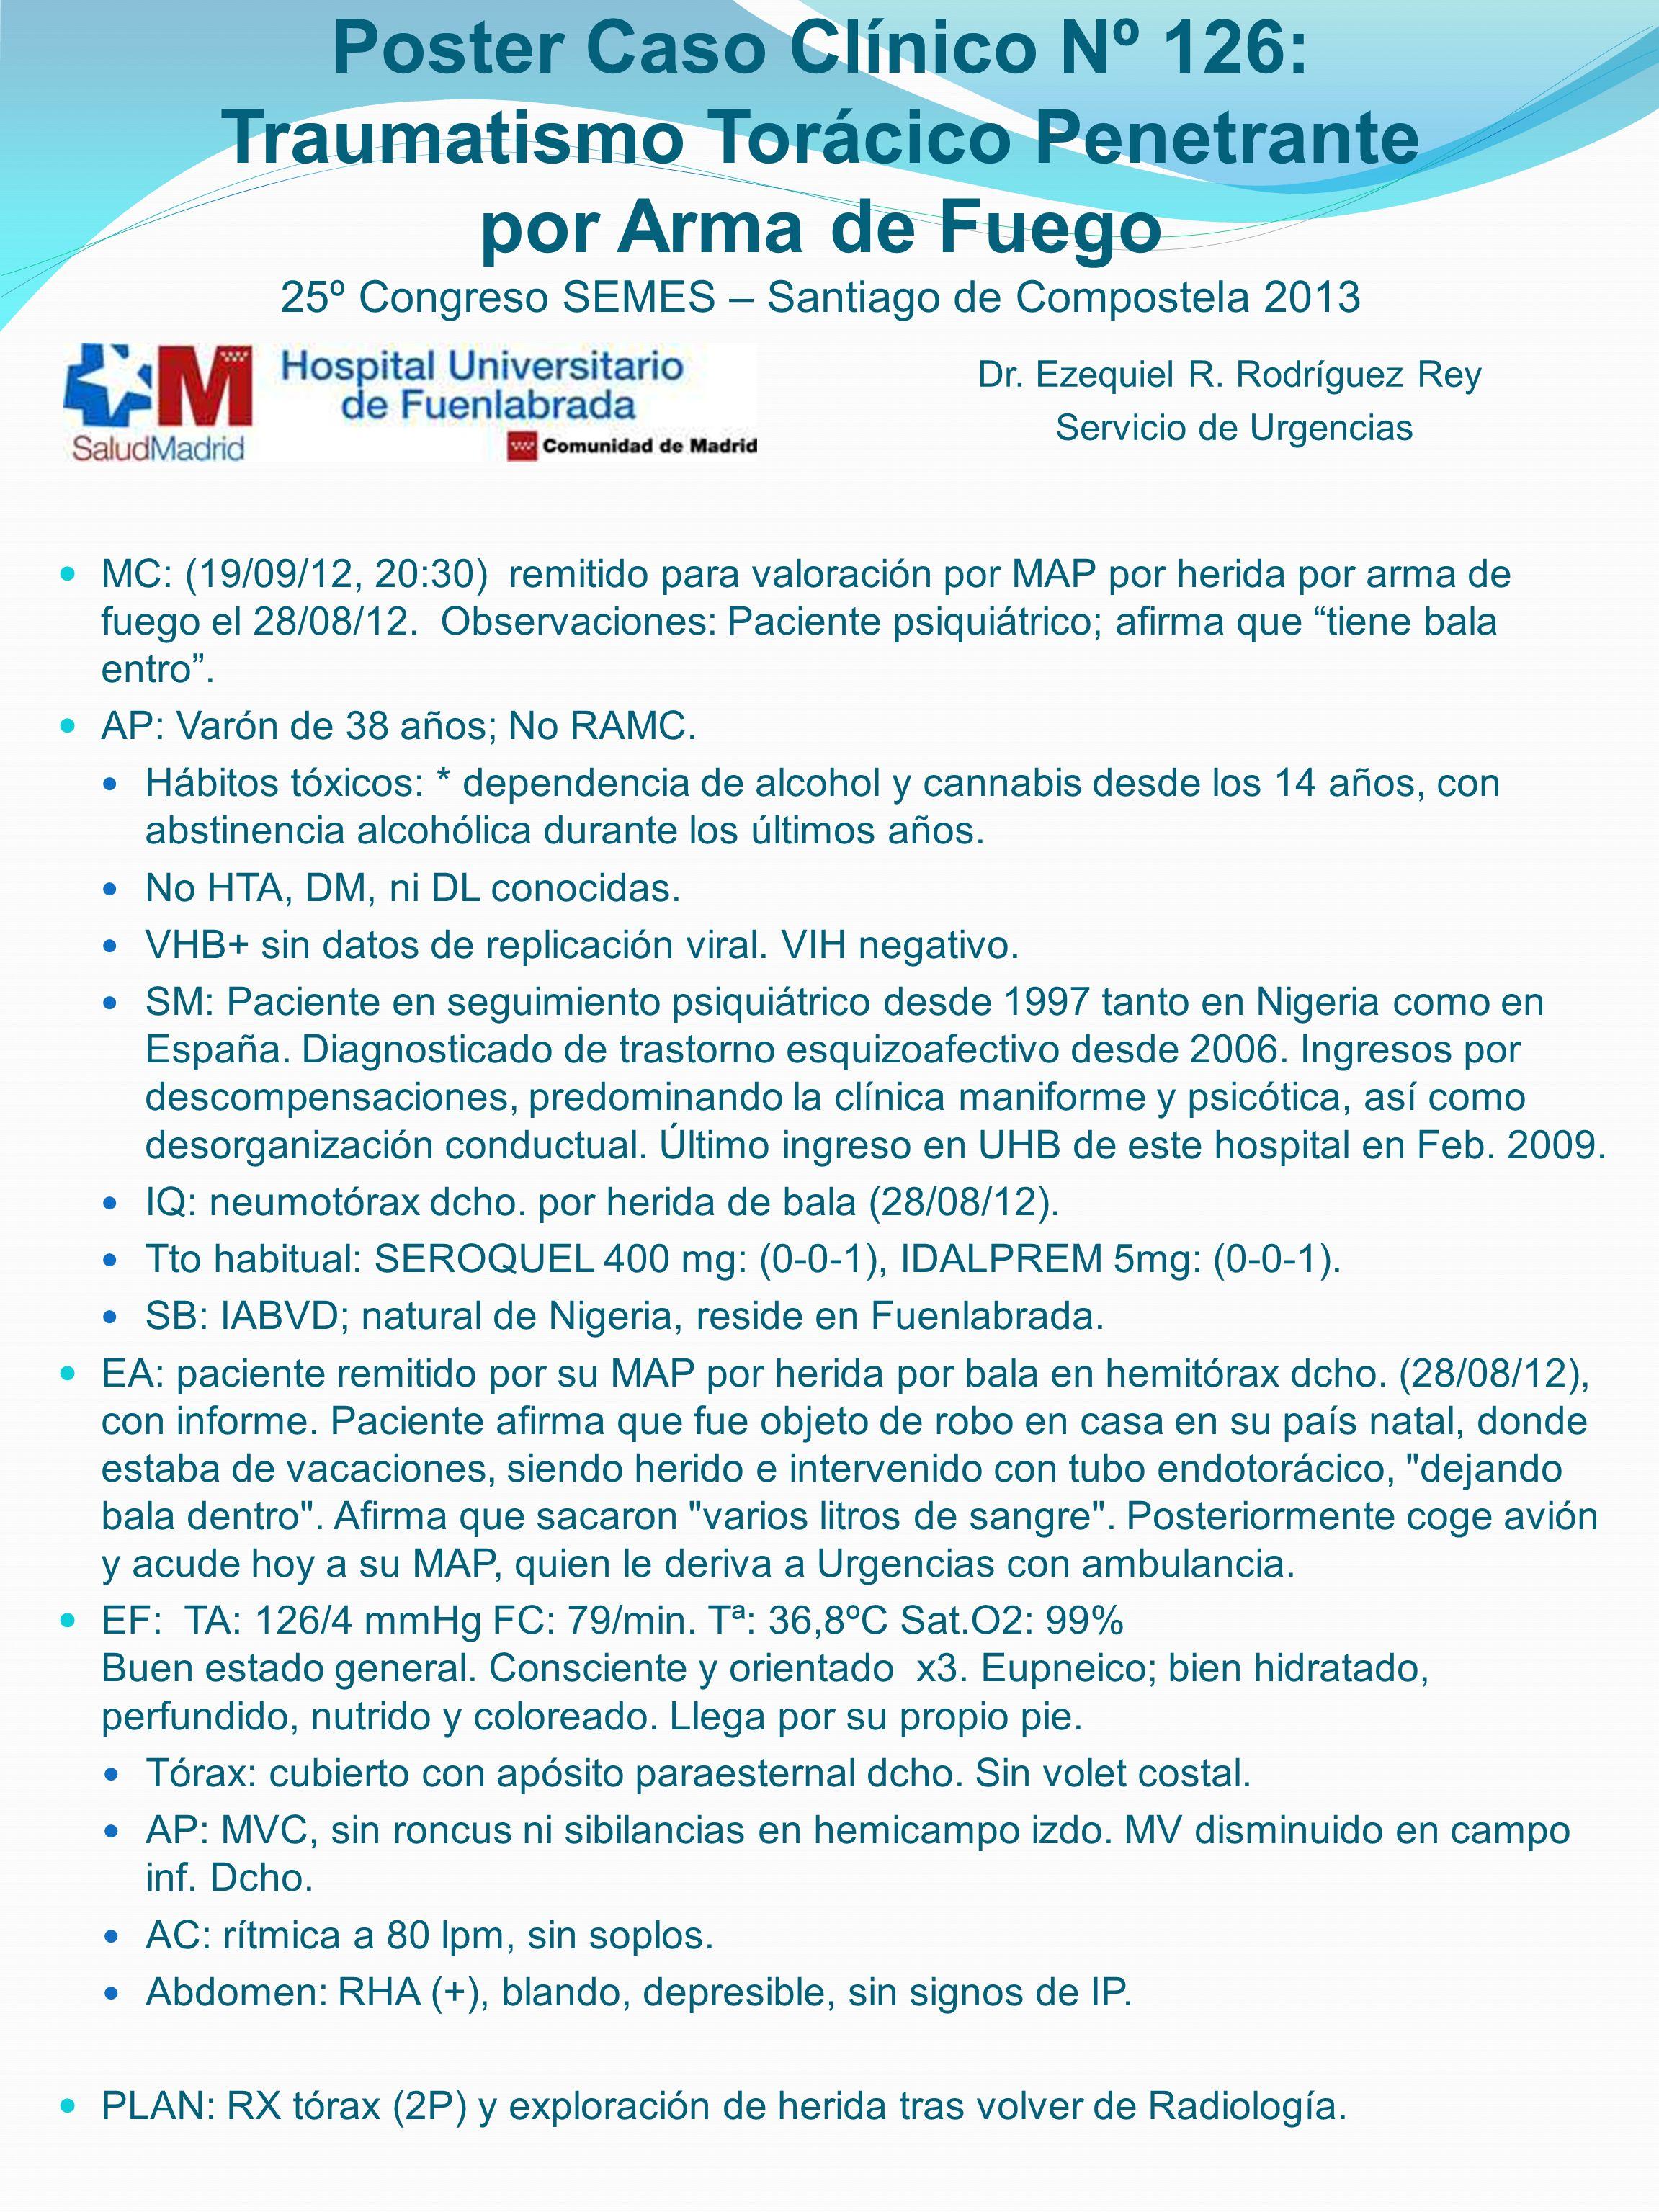 Poster Caso Clínico Nº 126: Traumatismo Torácico Penetrante por Arma de Fuego 25º Congreso SEMES – Santiago de Compostela 2013 MC: (19/09/12, 20:30) r